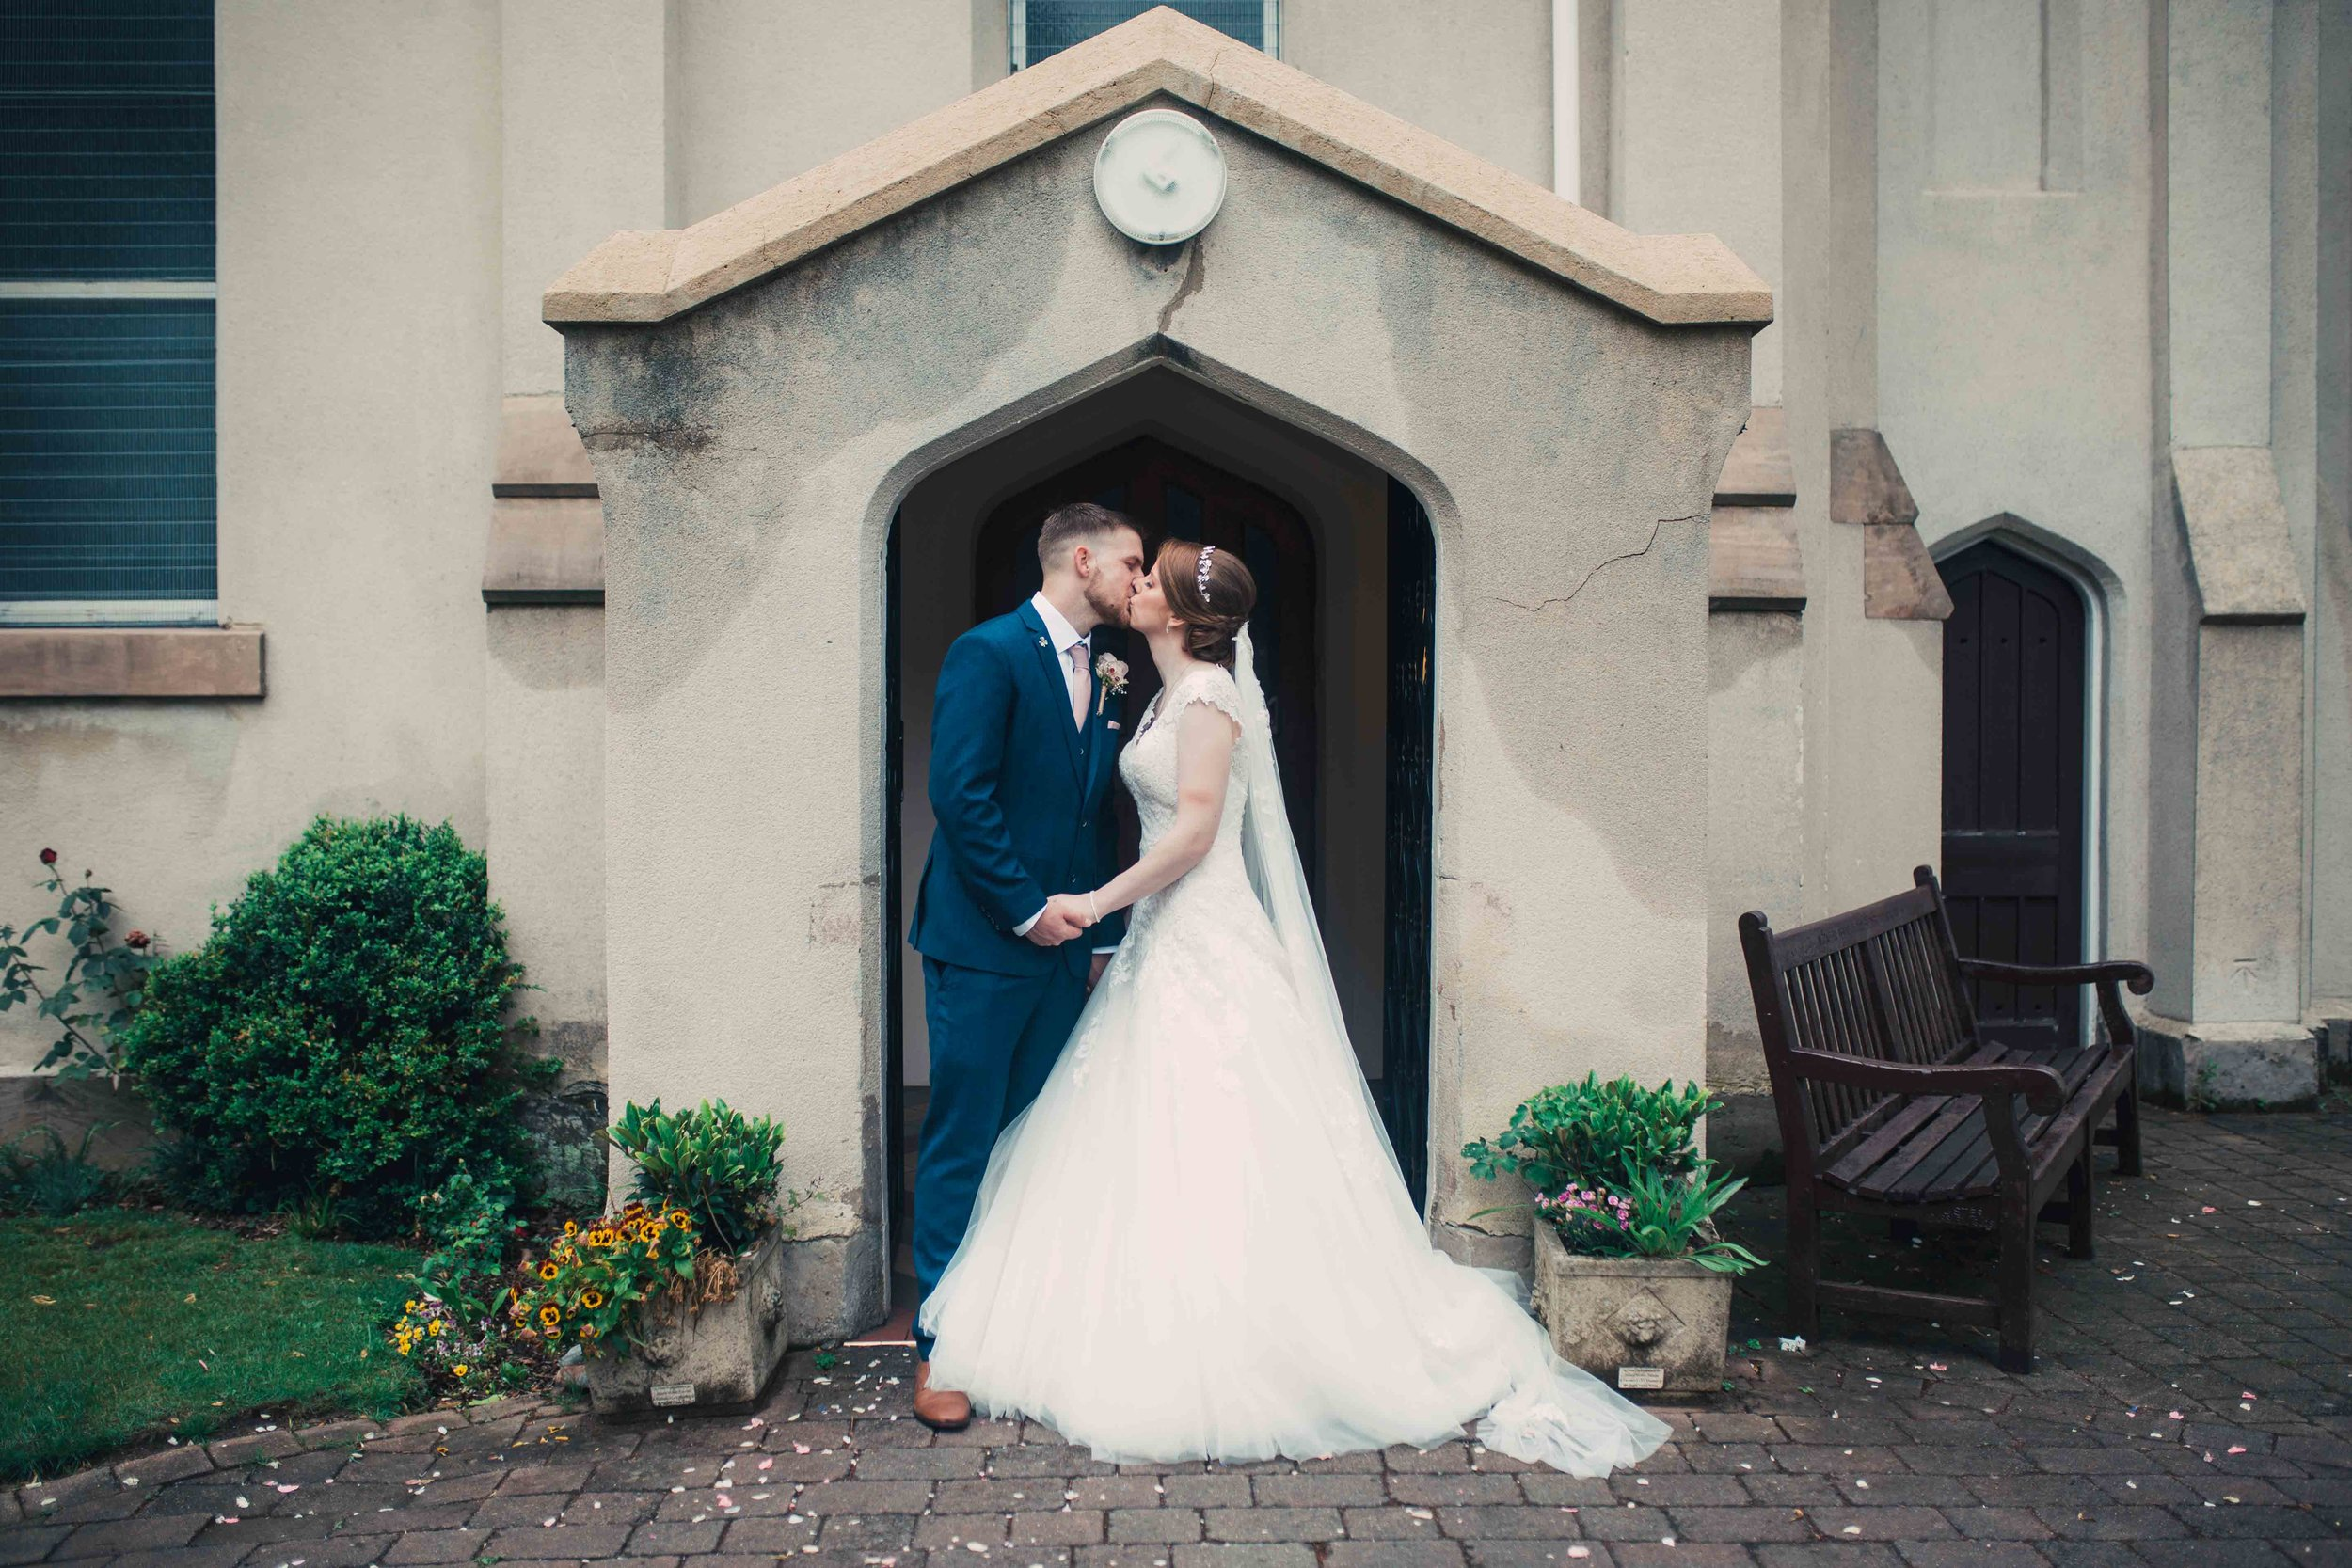 Lea-cooper-photography-willenhall-wolverhampton-wedding-photographer-birmingham-shirley-west-midlands-ceremony-church-25.JPG